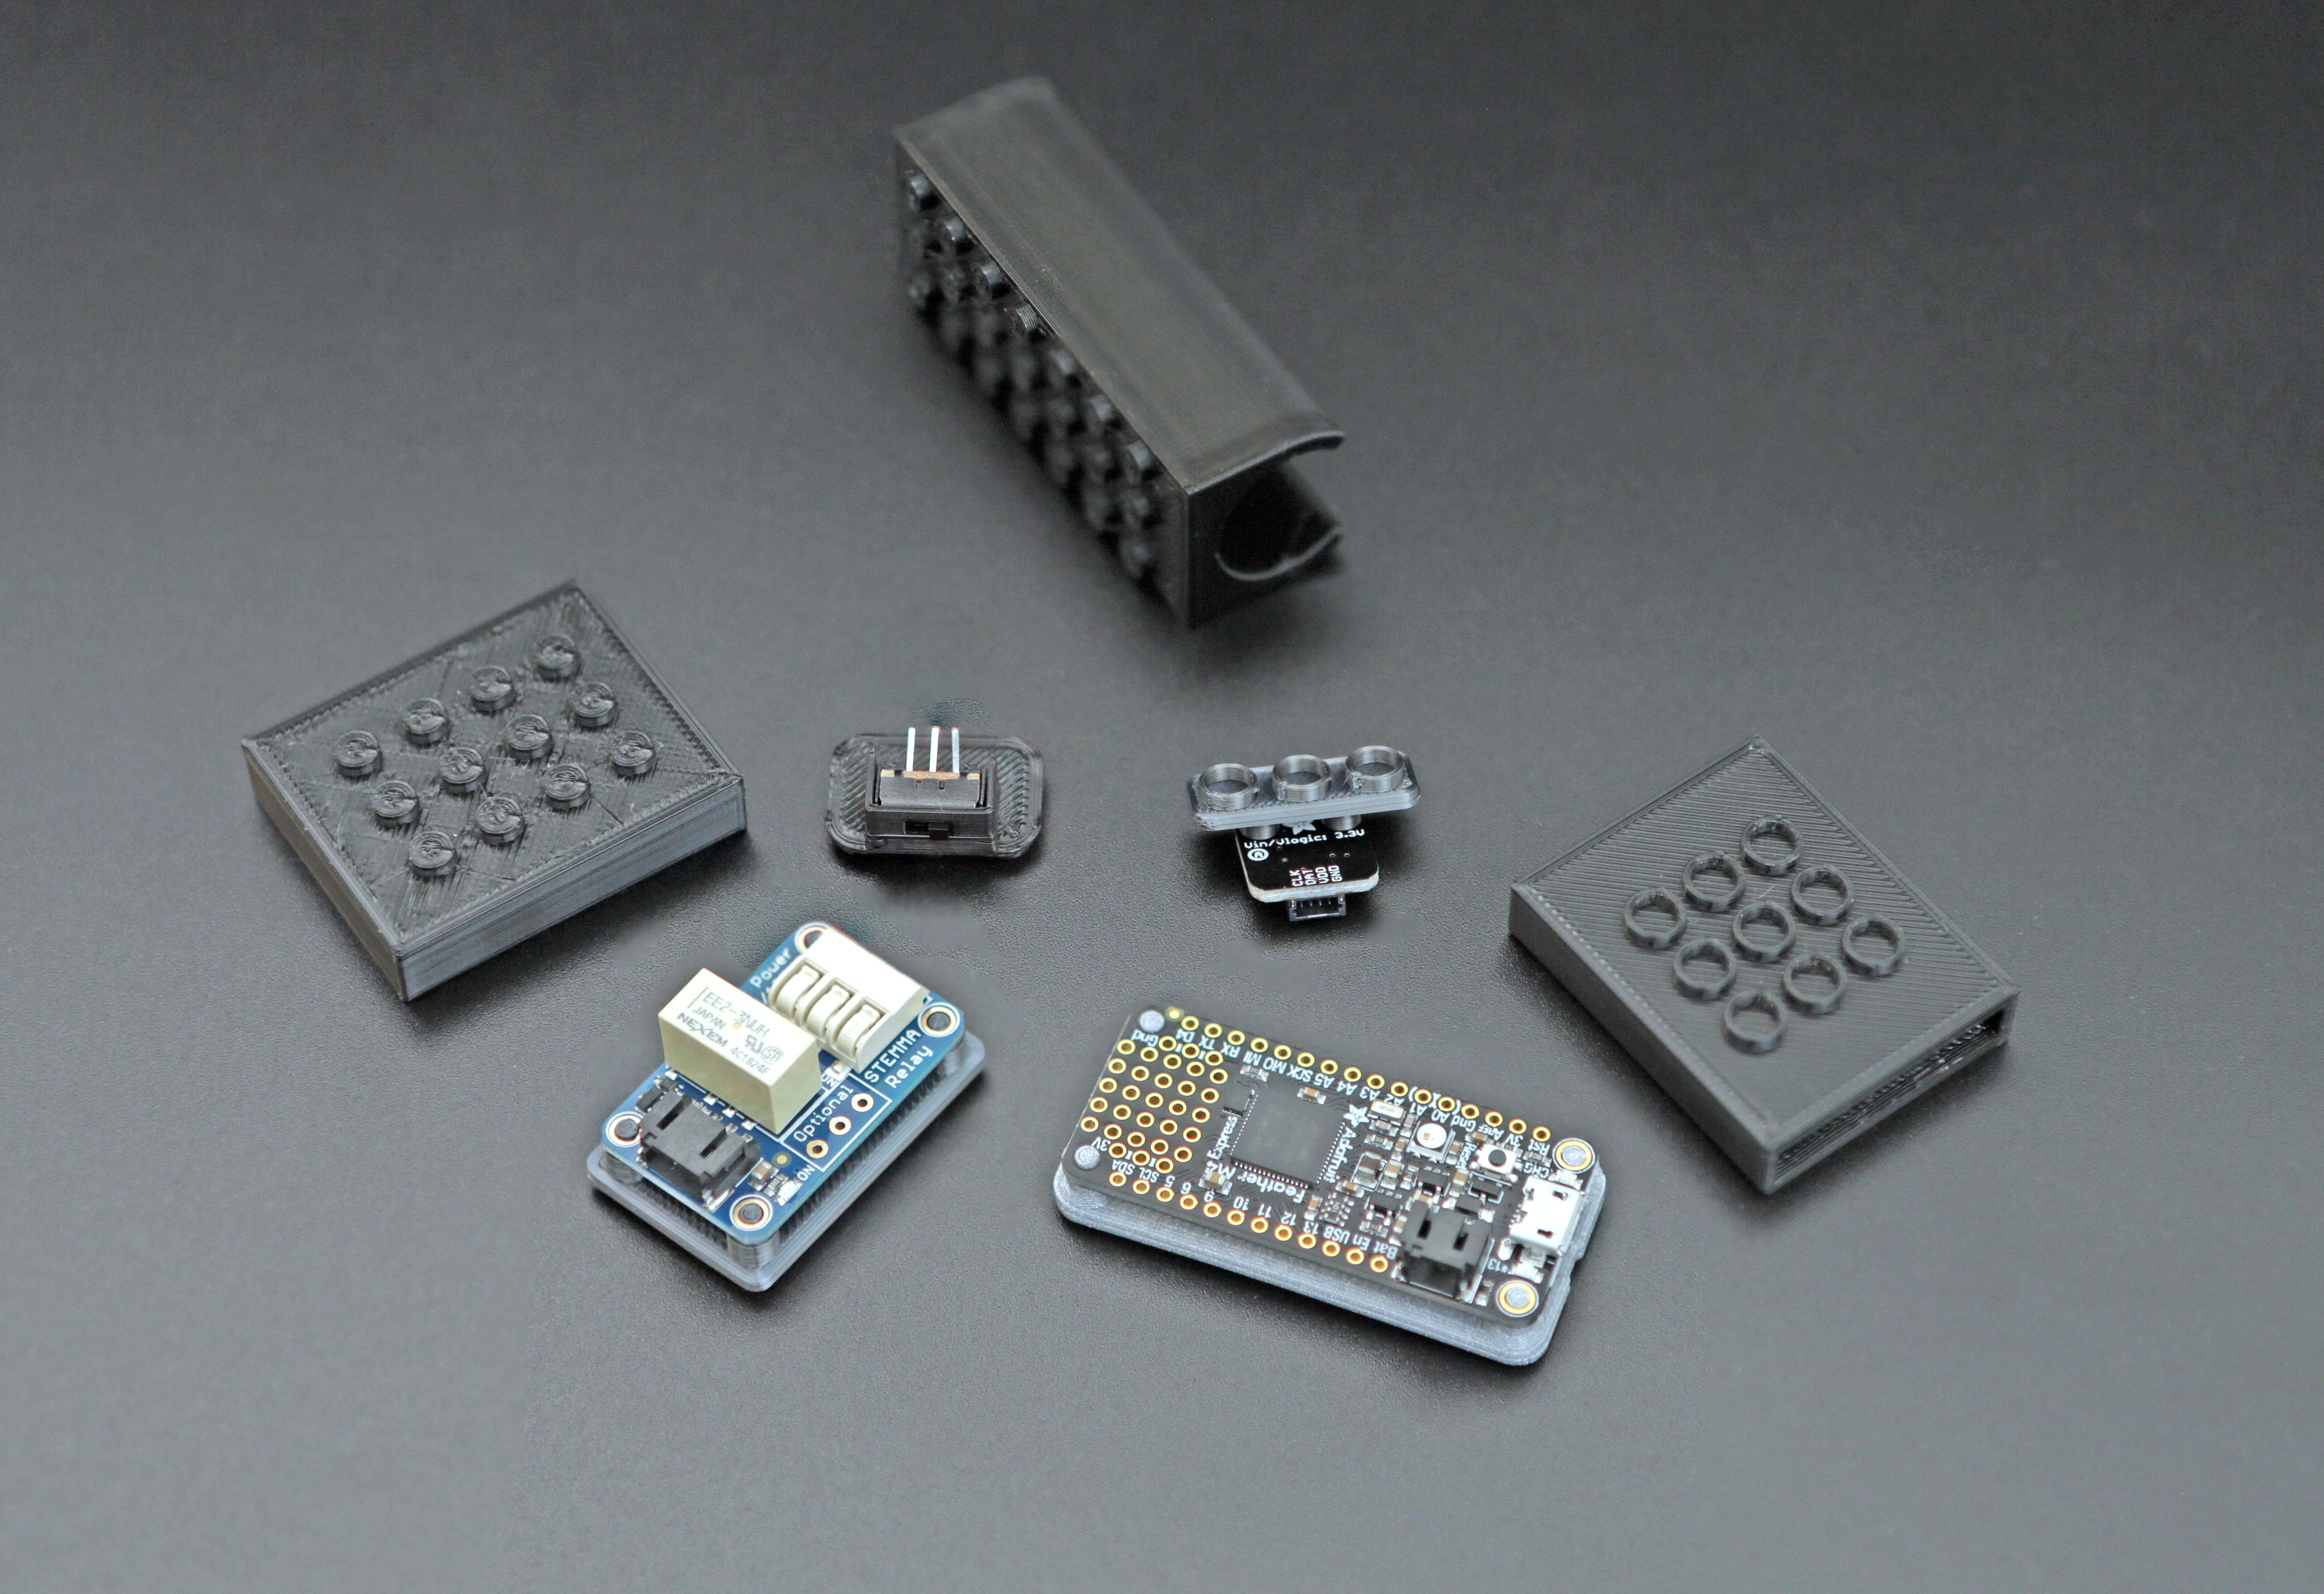 3d_printing_componentsB.jpg